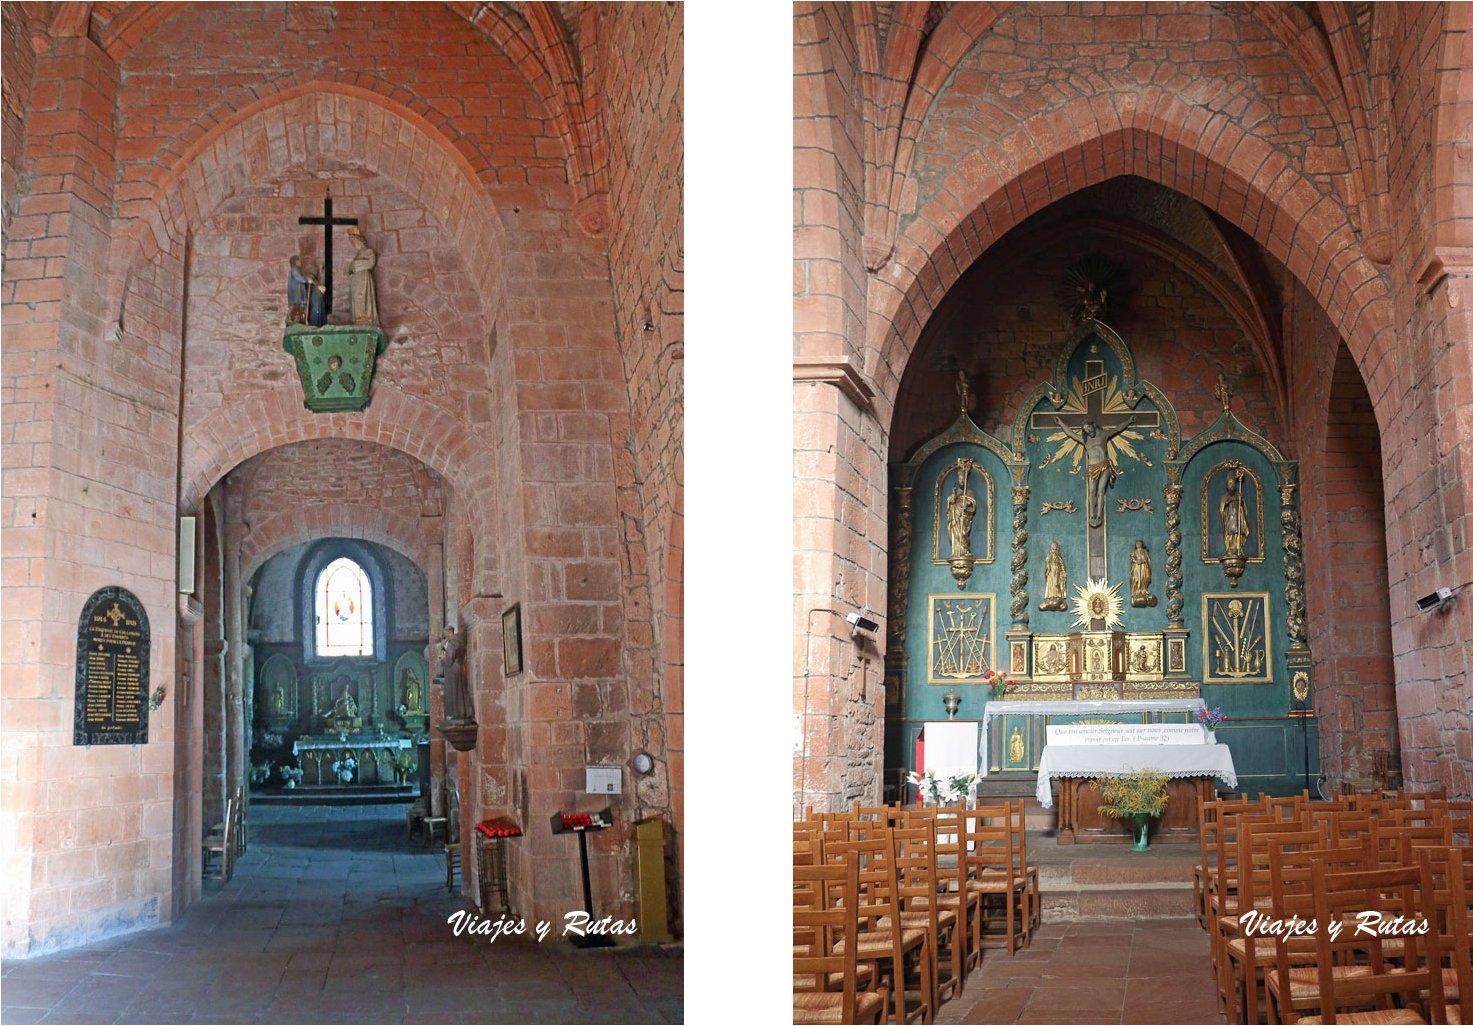 Interior de la Iglesia de San Pedro, Collonges la Rouge, Francia